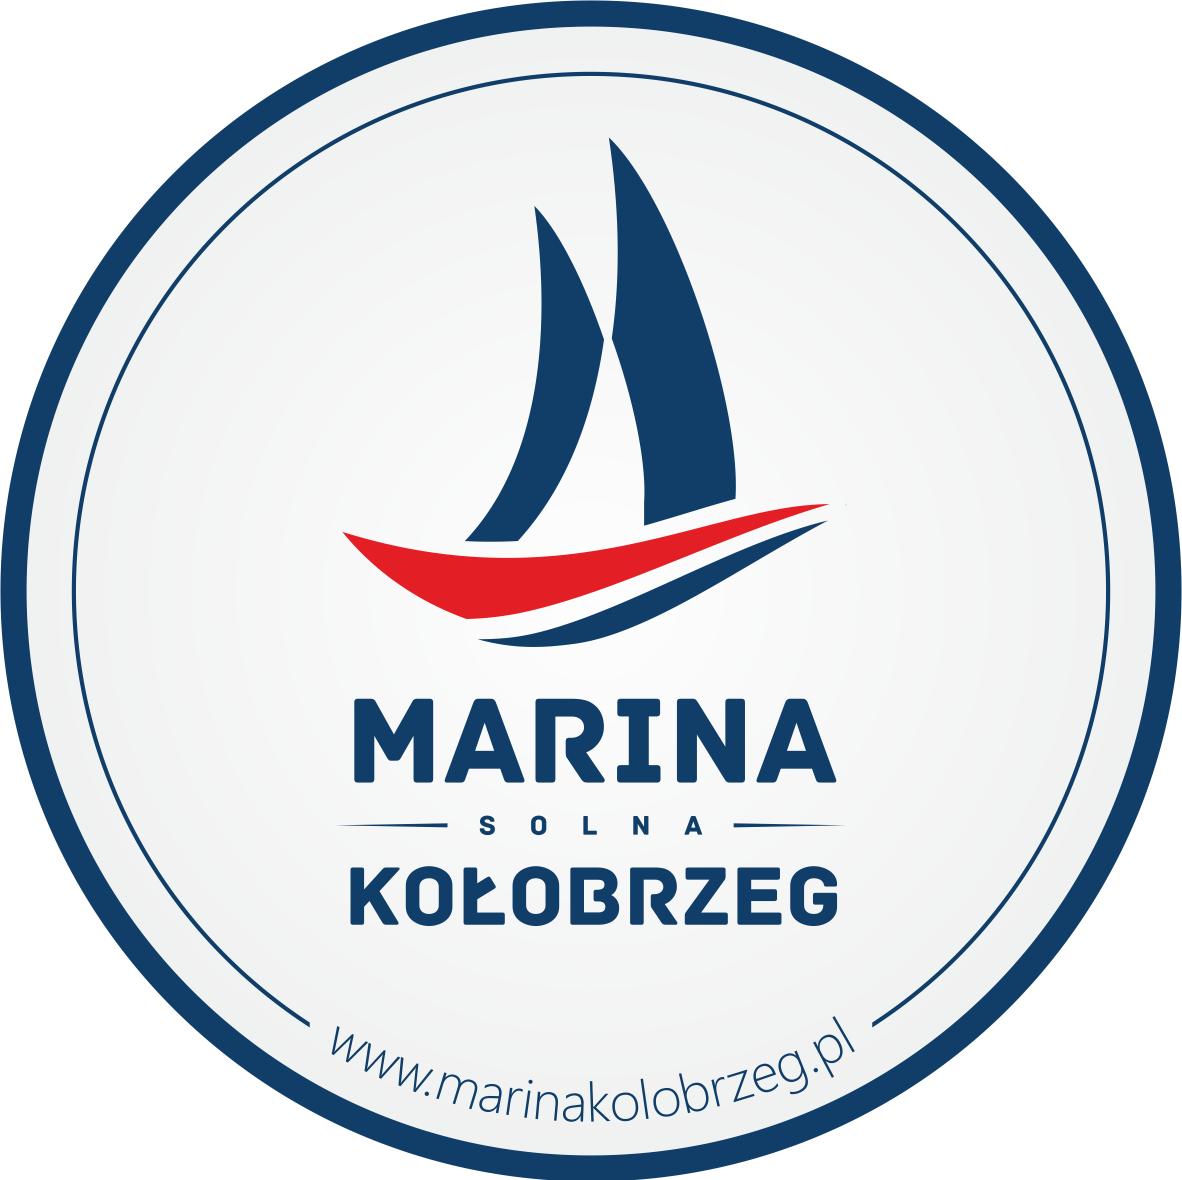 Marina Kołobrzeg